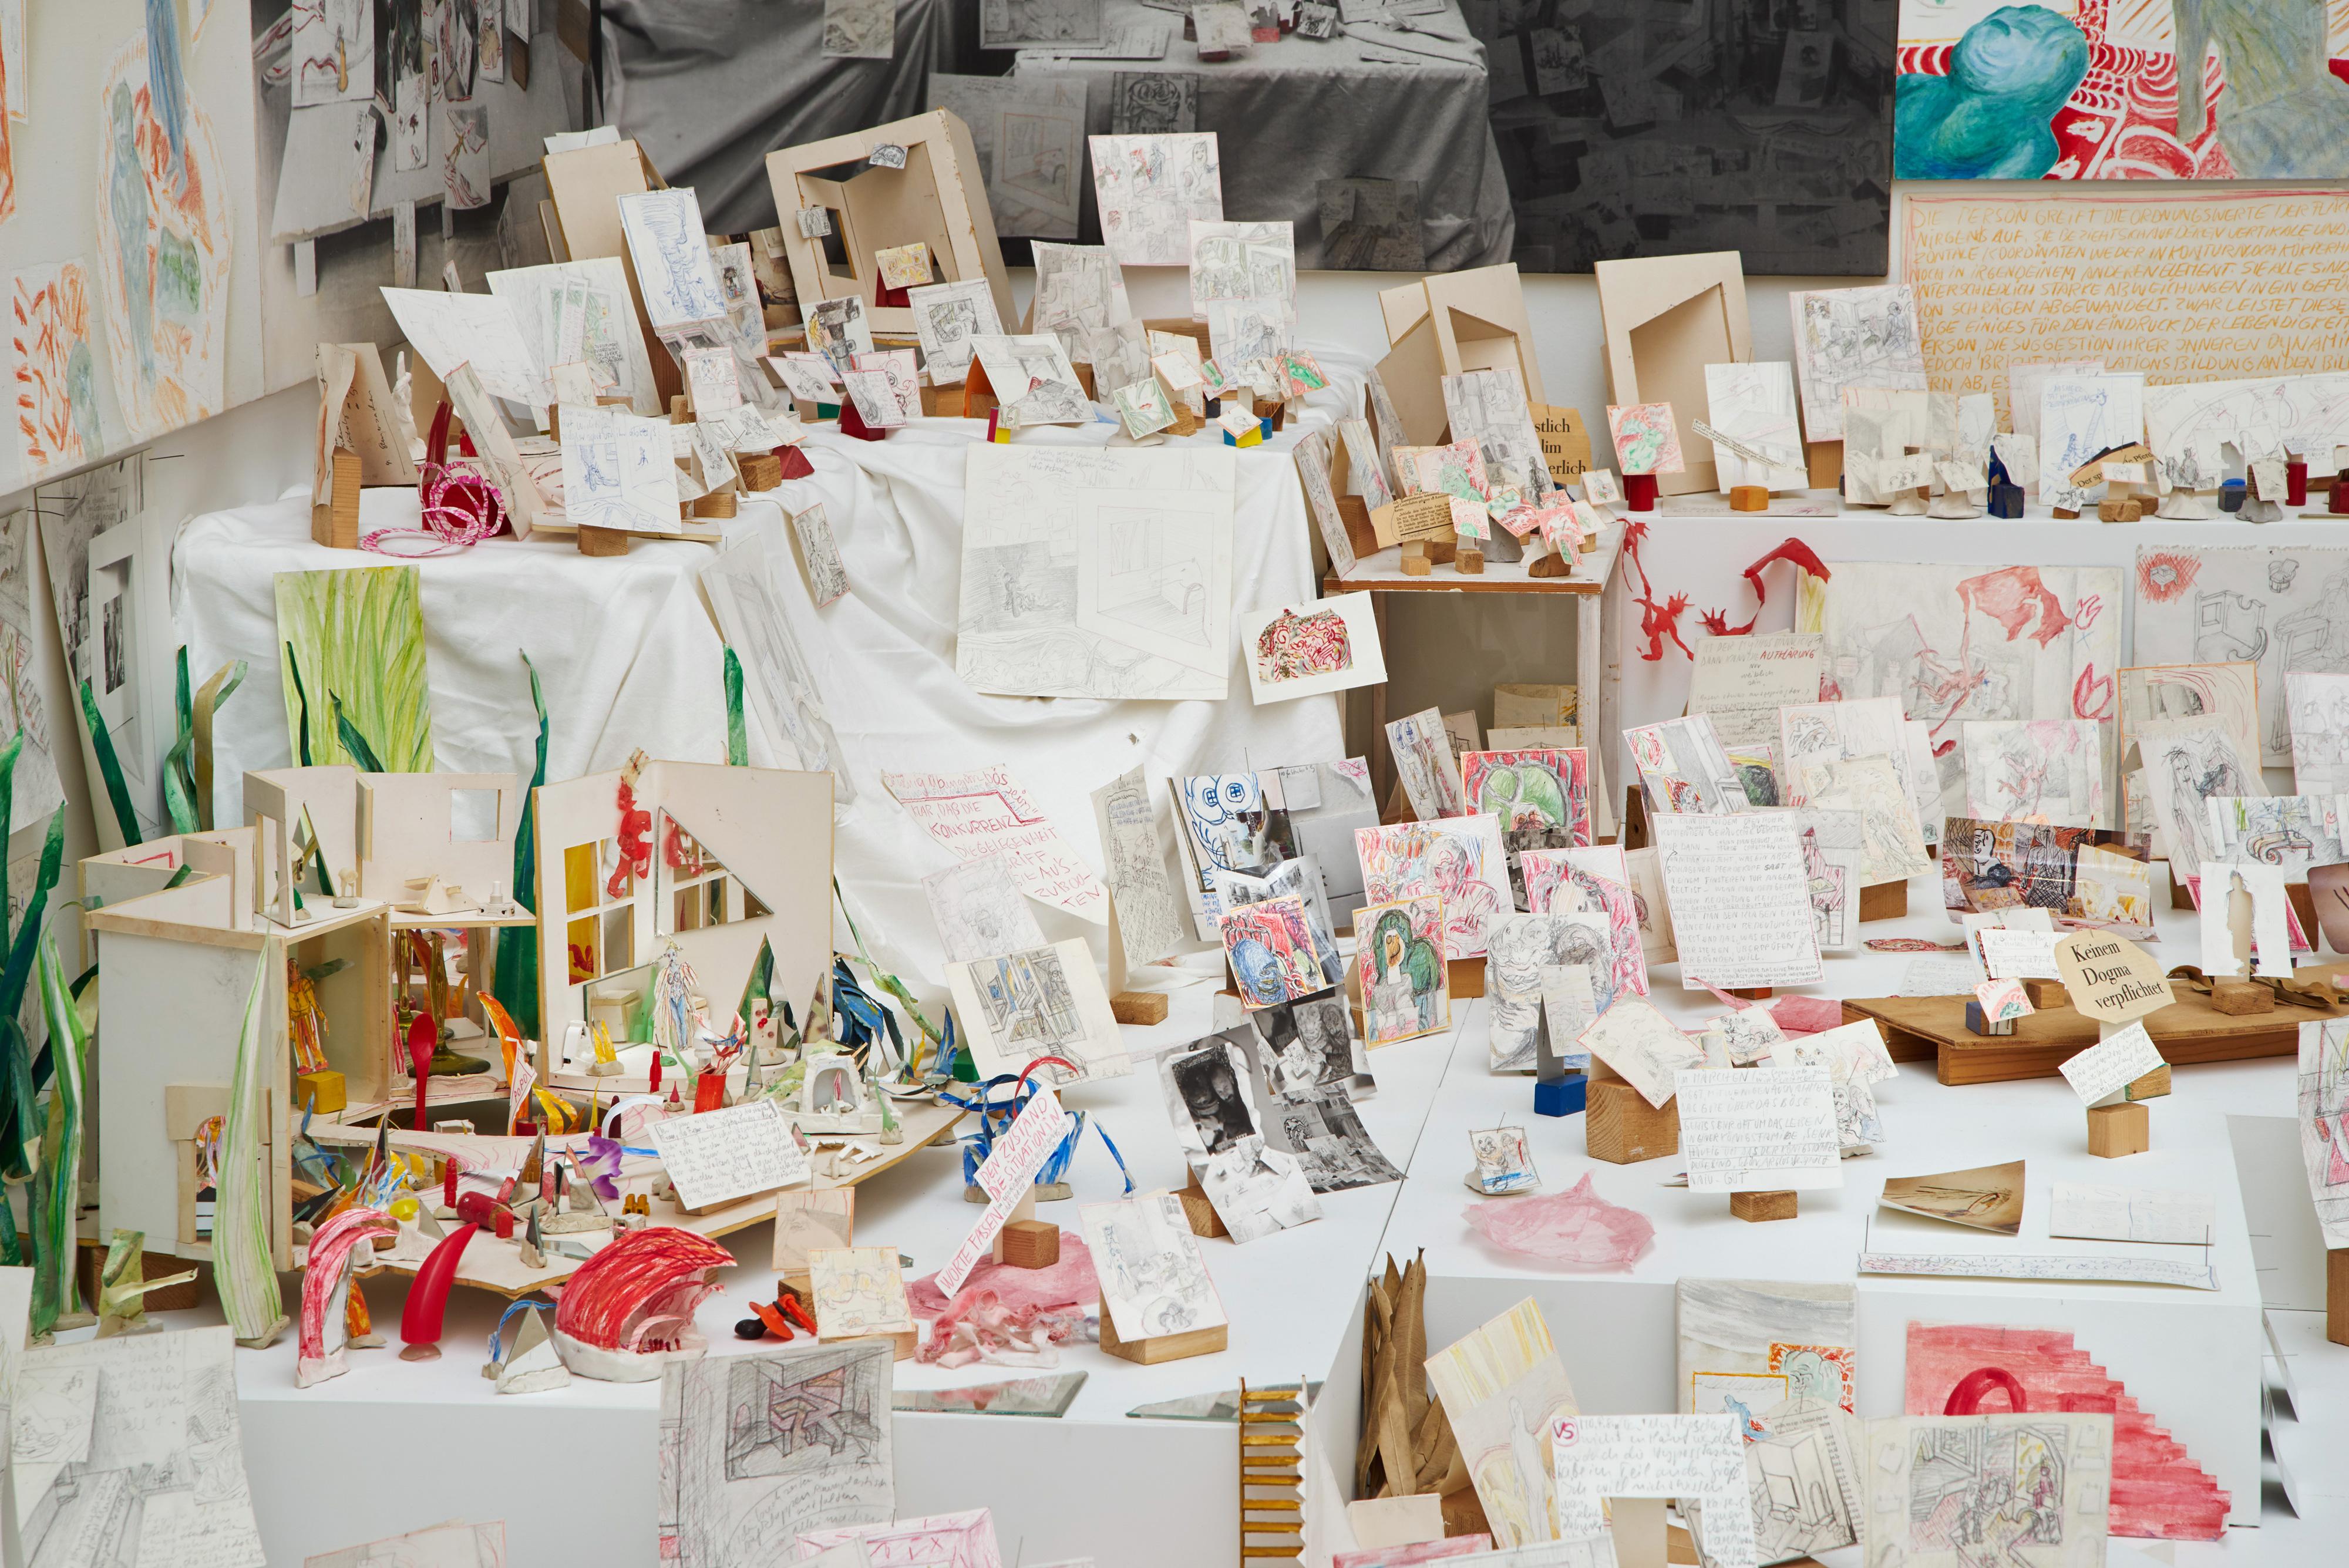 Galerie Barbara Thumm \ Anna Oppermann – Mass and Power